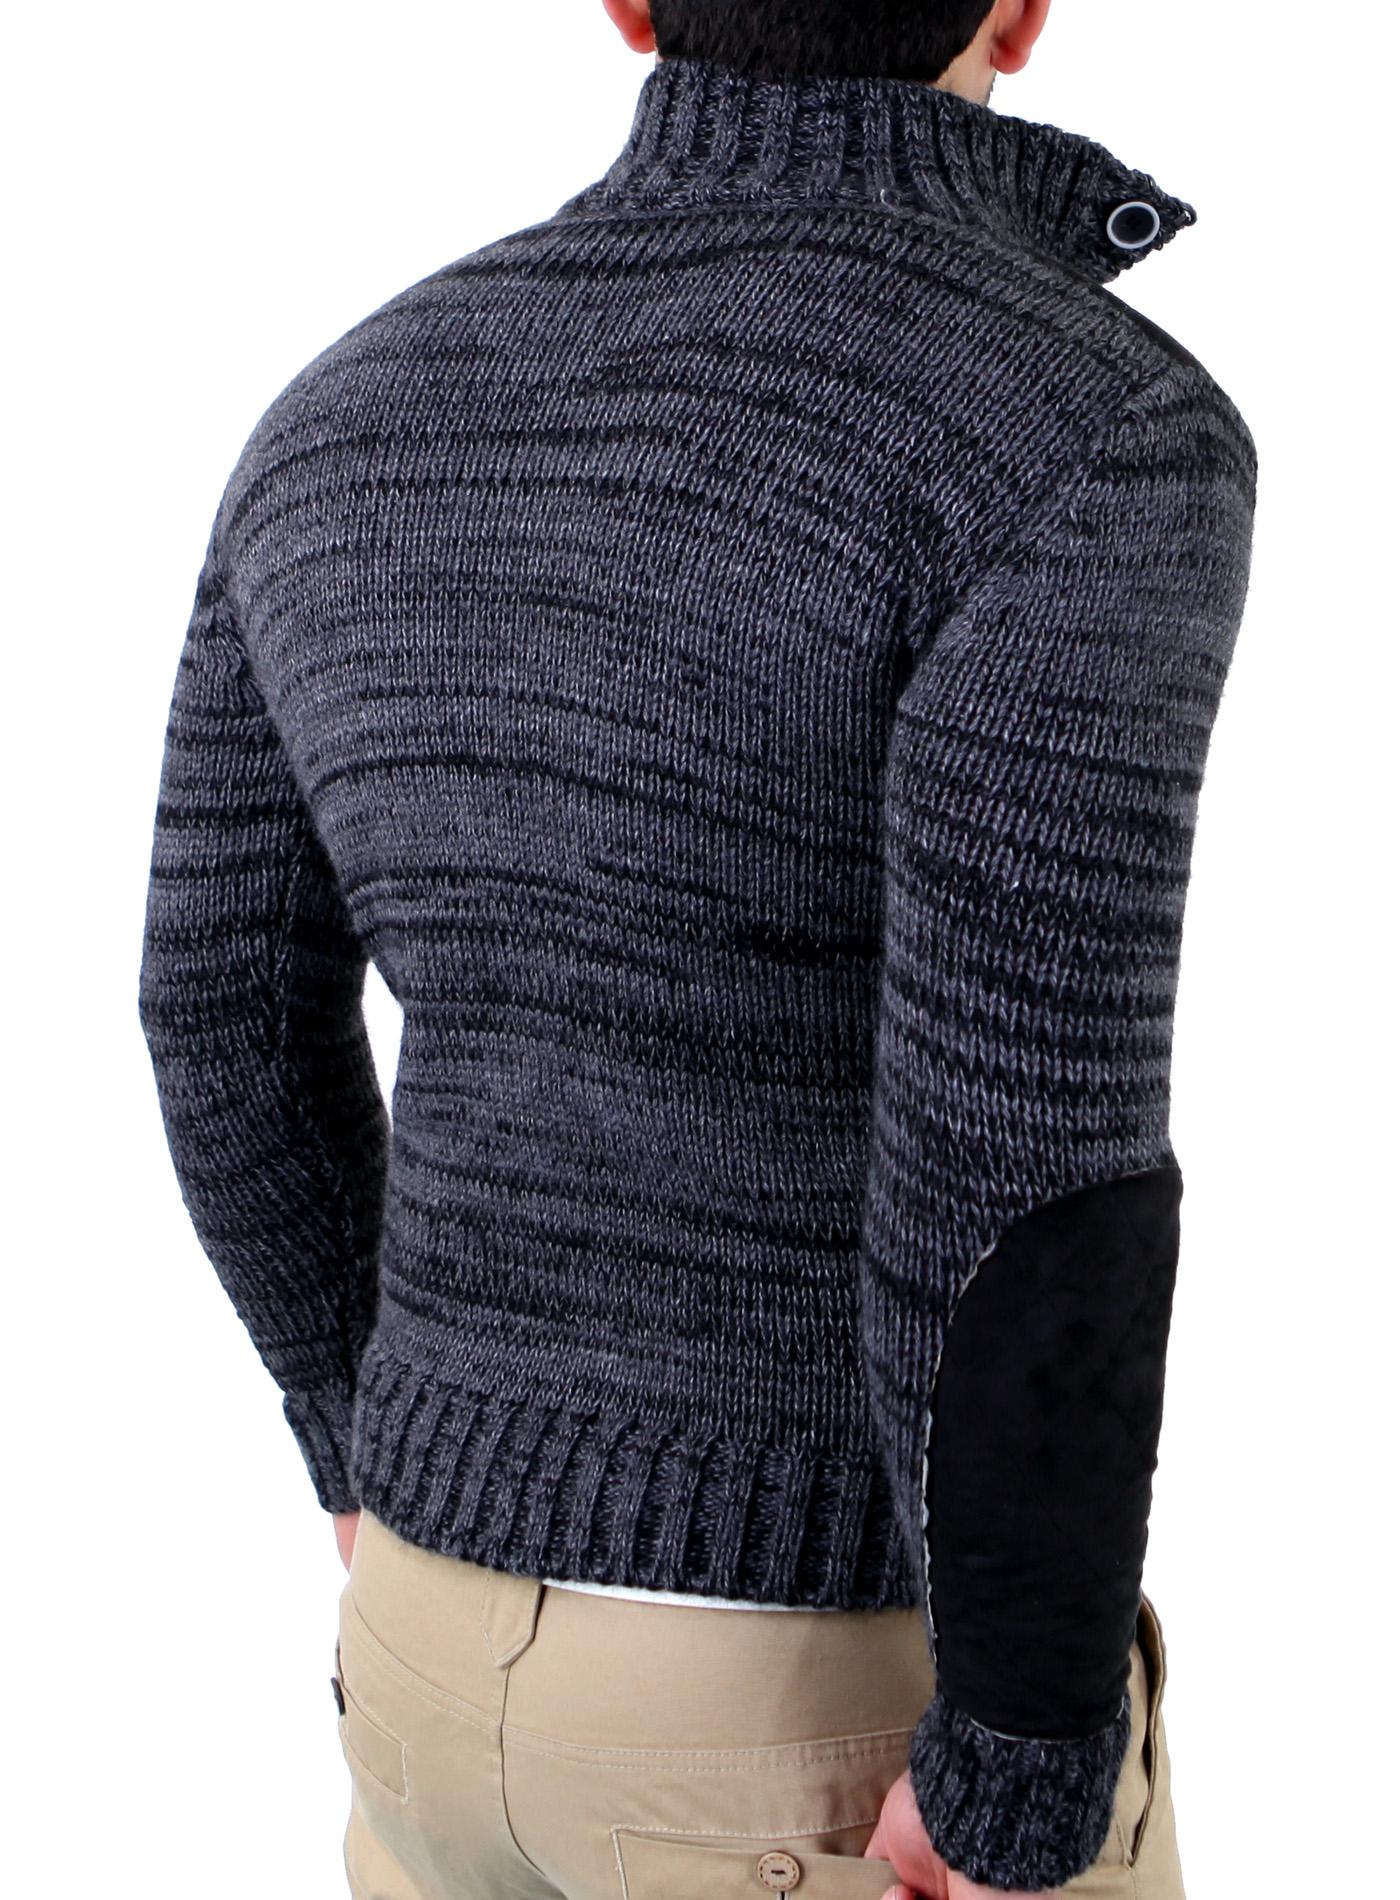 tazzio tz 406 herren winter pullover pulli sweatshirt strickjacke strickpullover ebay. Black Bedroom Furniture Sets. Home Design Ideas